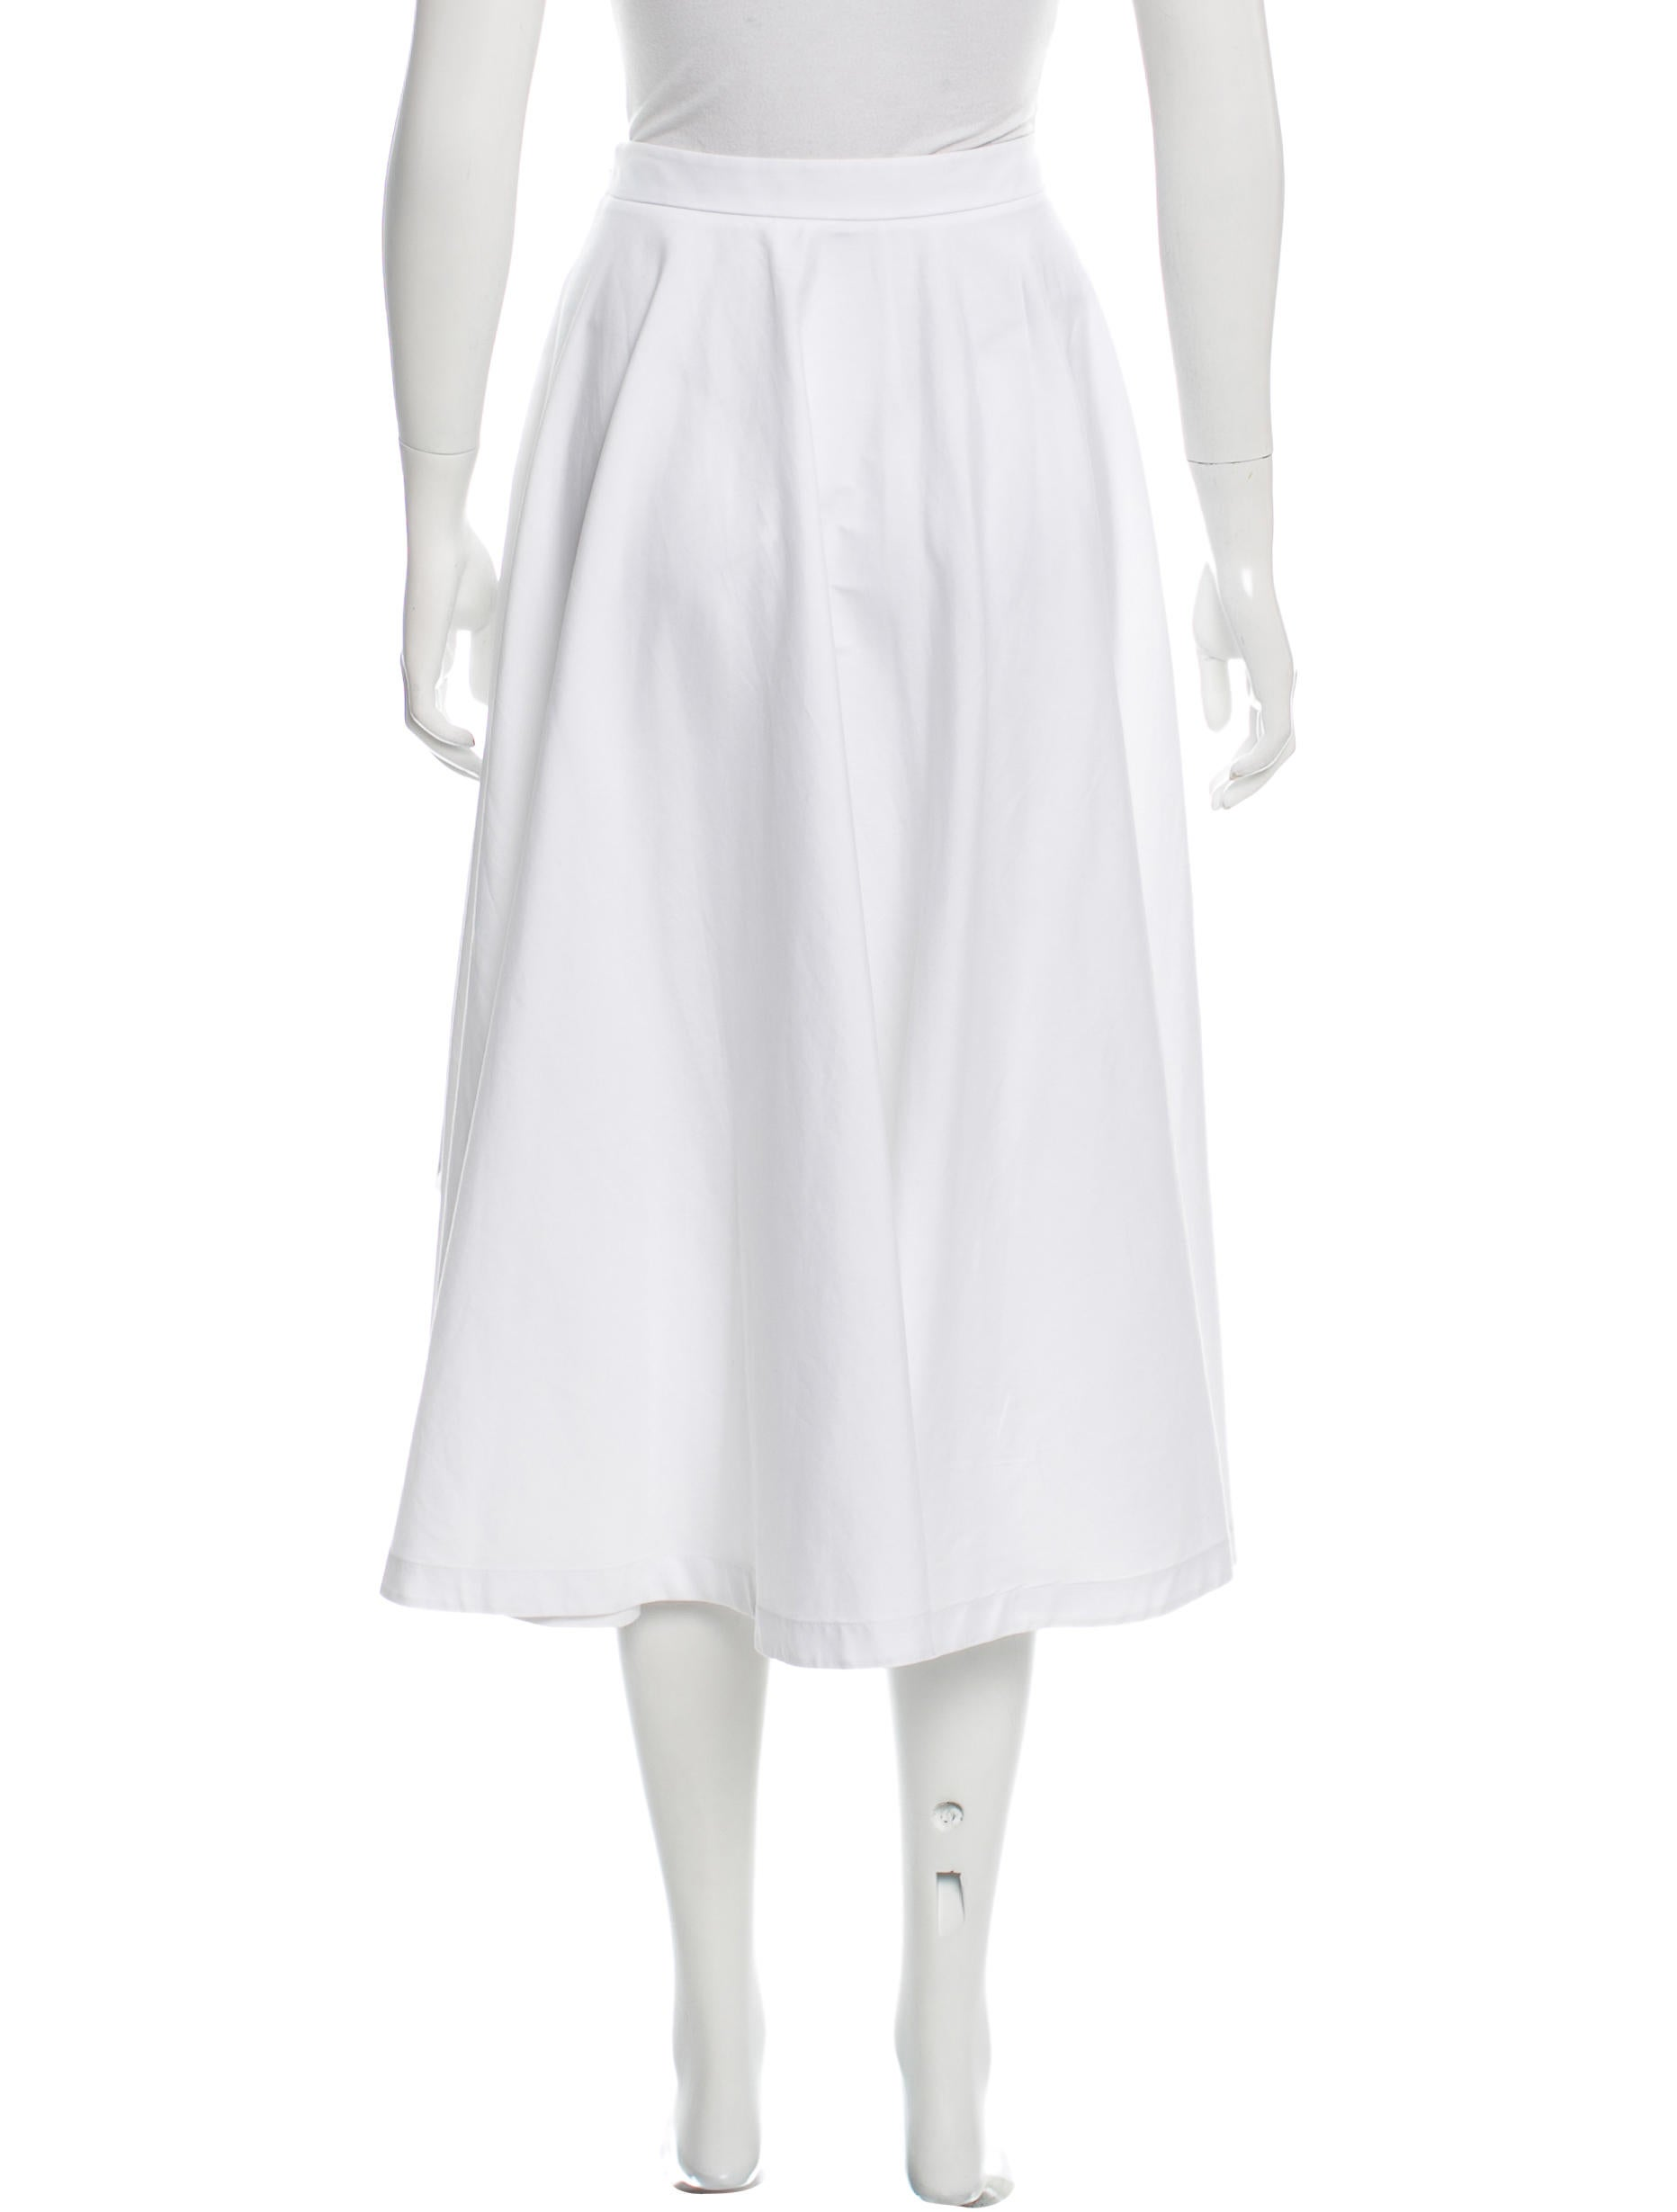 robert rodriguez semi sheer high low midi skirt clothing